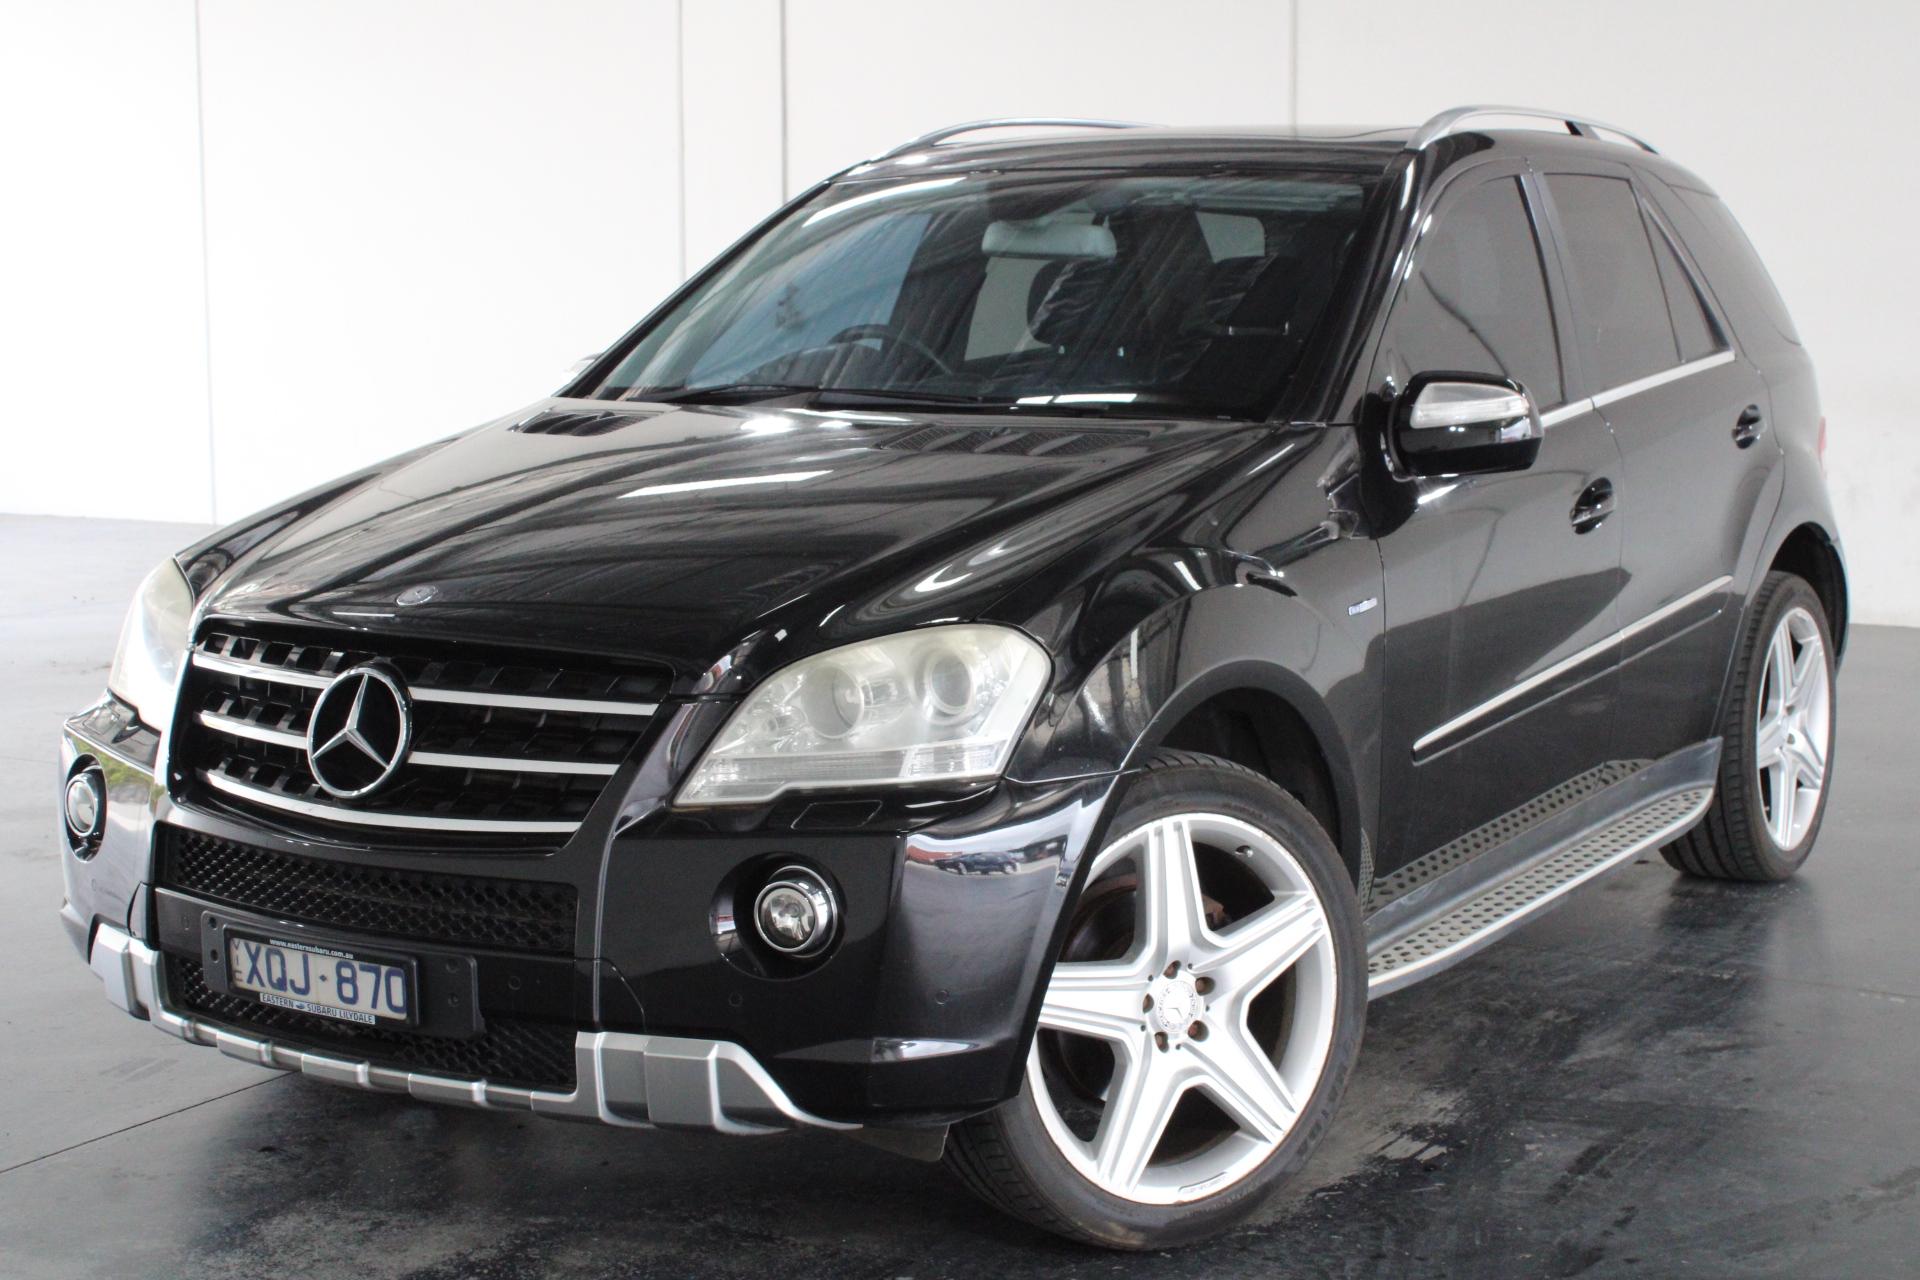 2010 Mercedes Benz ML 300 CDI (4x4) W164 Turbo Diesel Automatic SUV